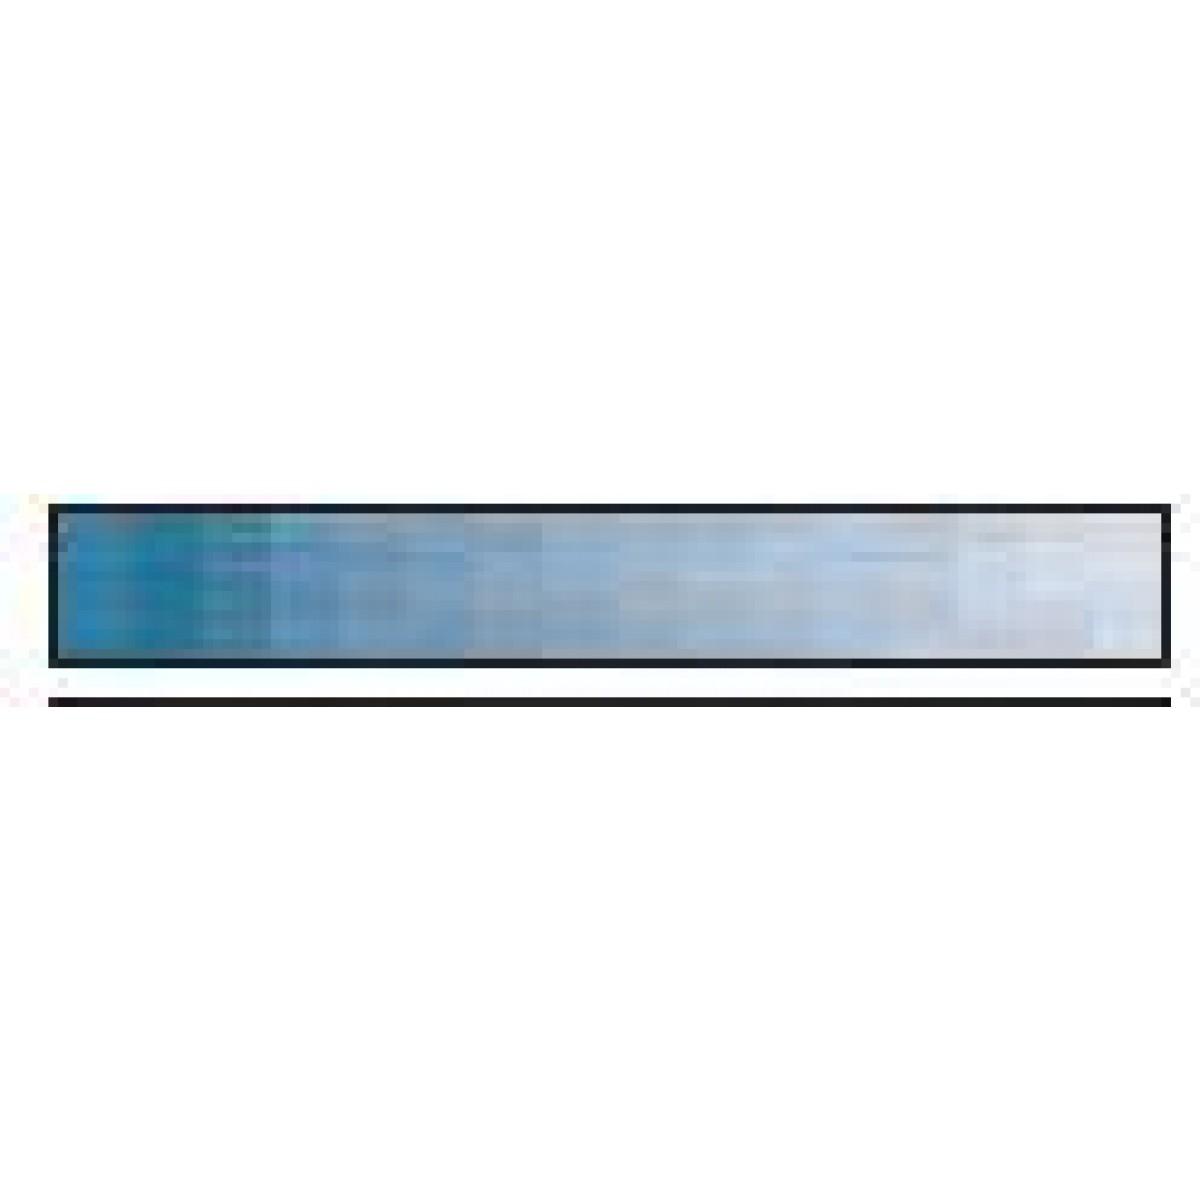 8575 Kunstnerkvalitet soft pastel Dark turquois